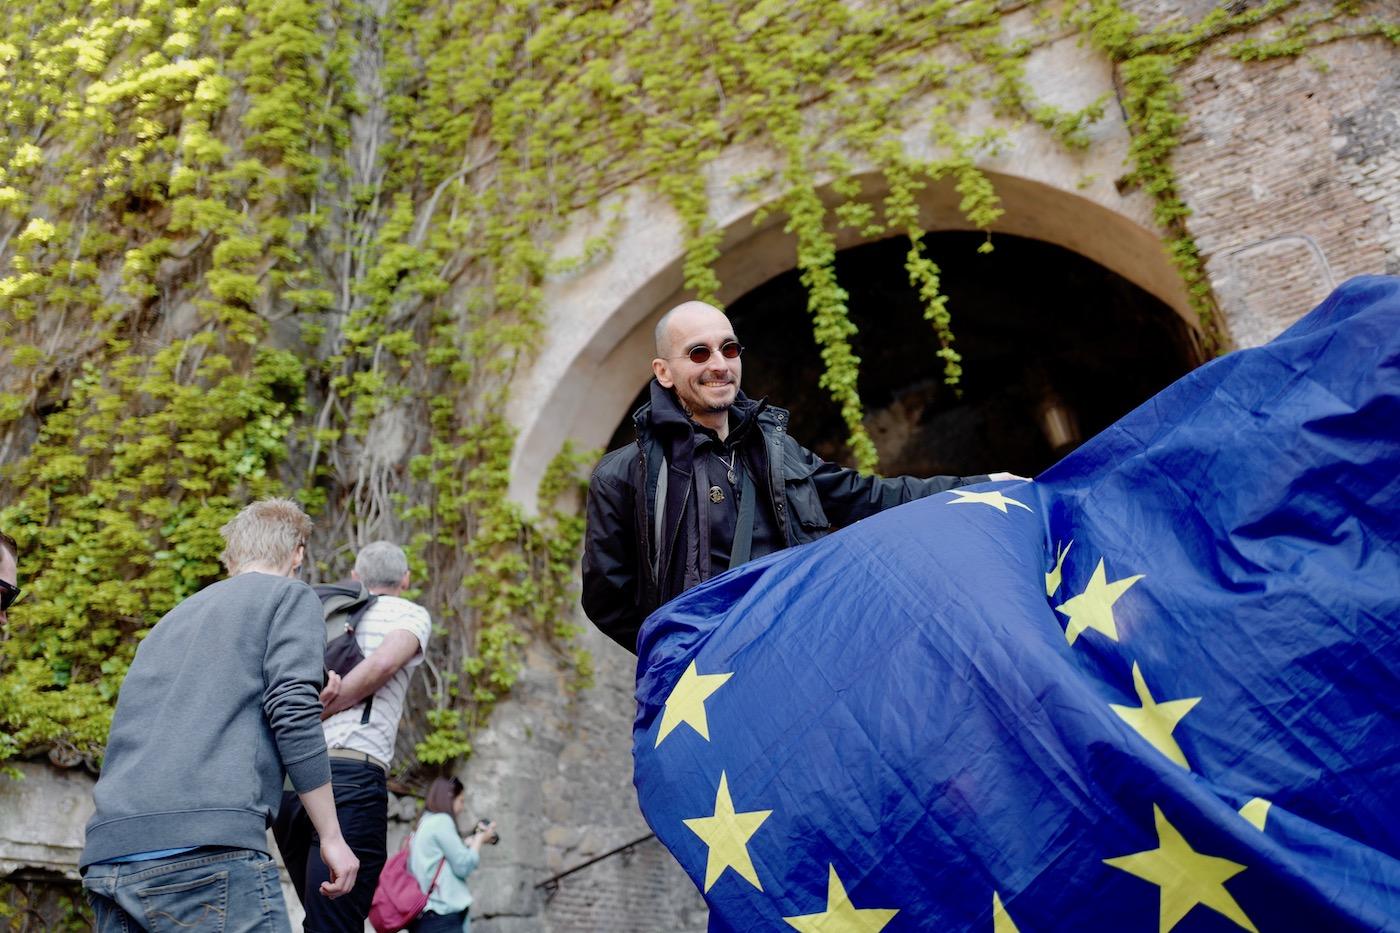 mark_benecke_europa - 32.jpg